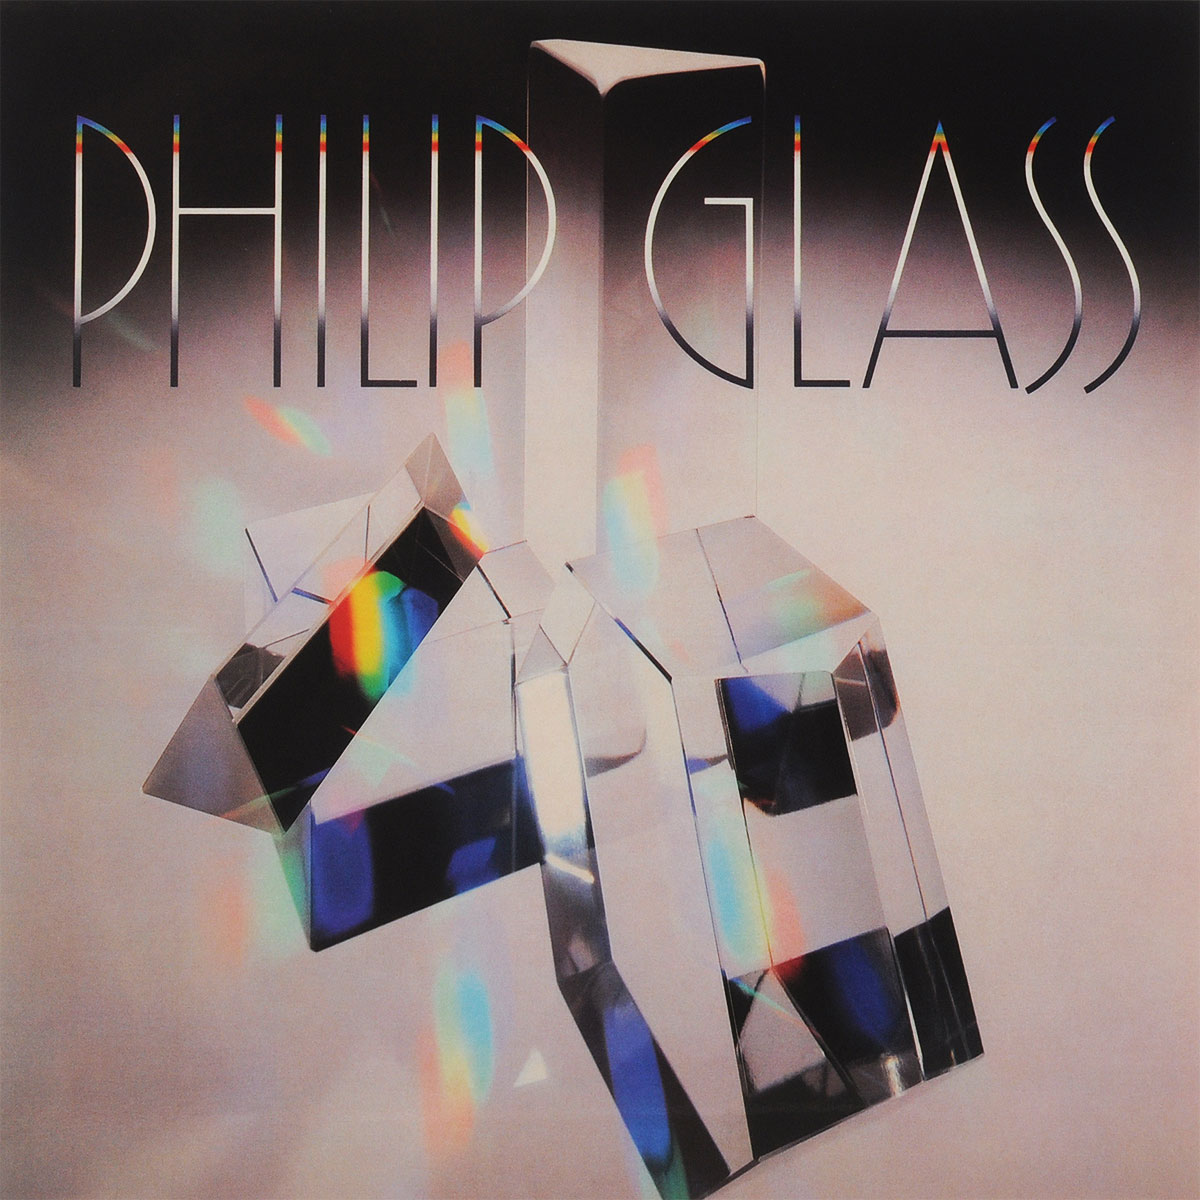 LP 1:Tracks 1 - 3LP 2:Tracks 4 - 6